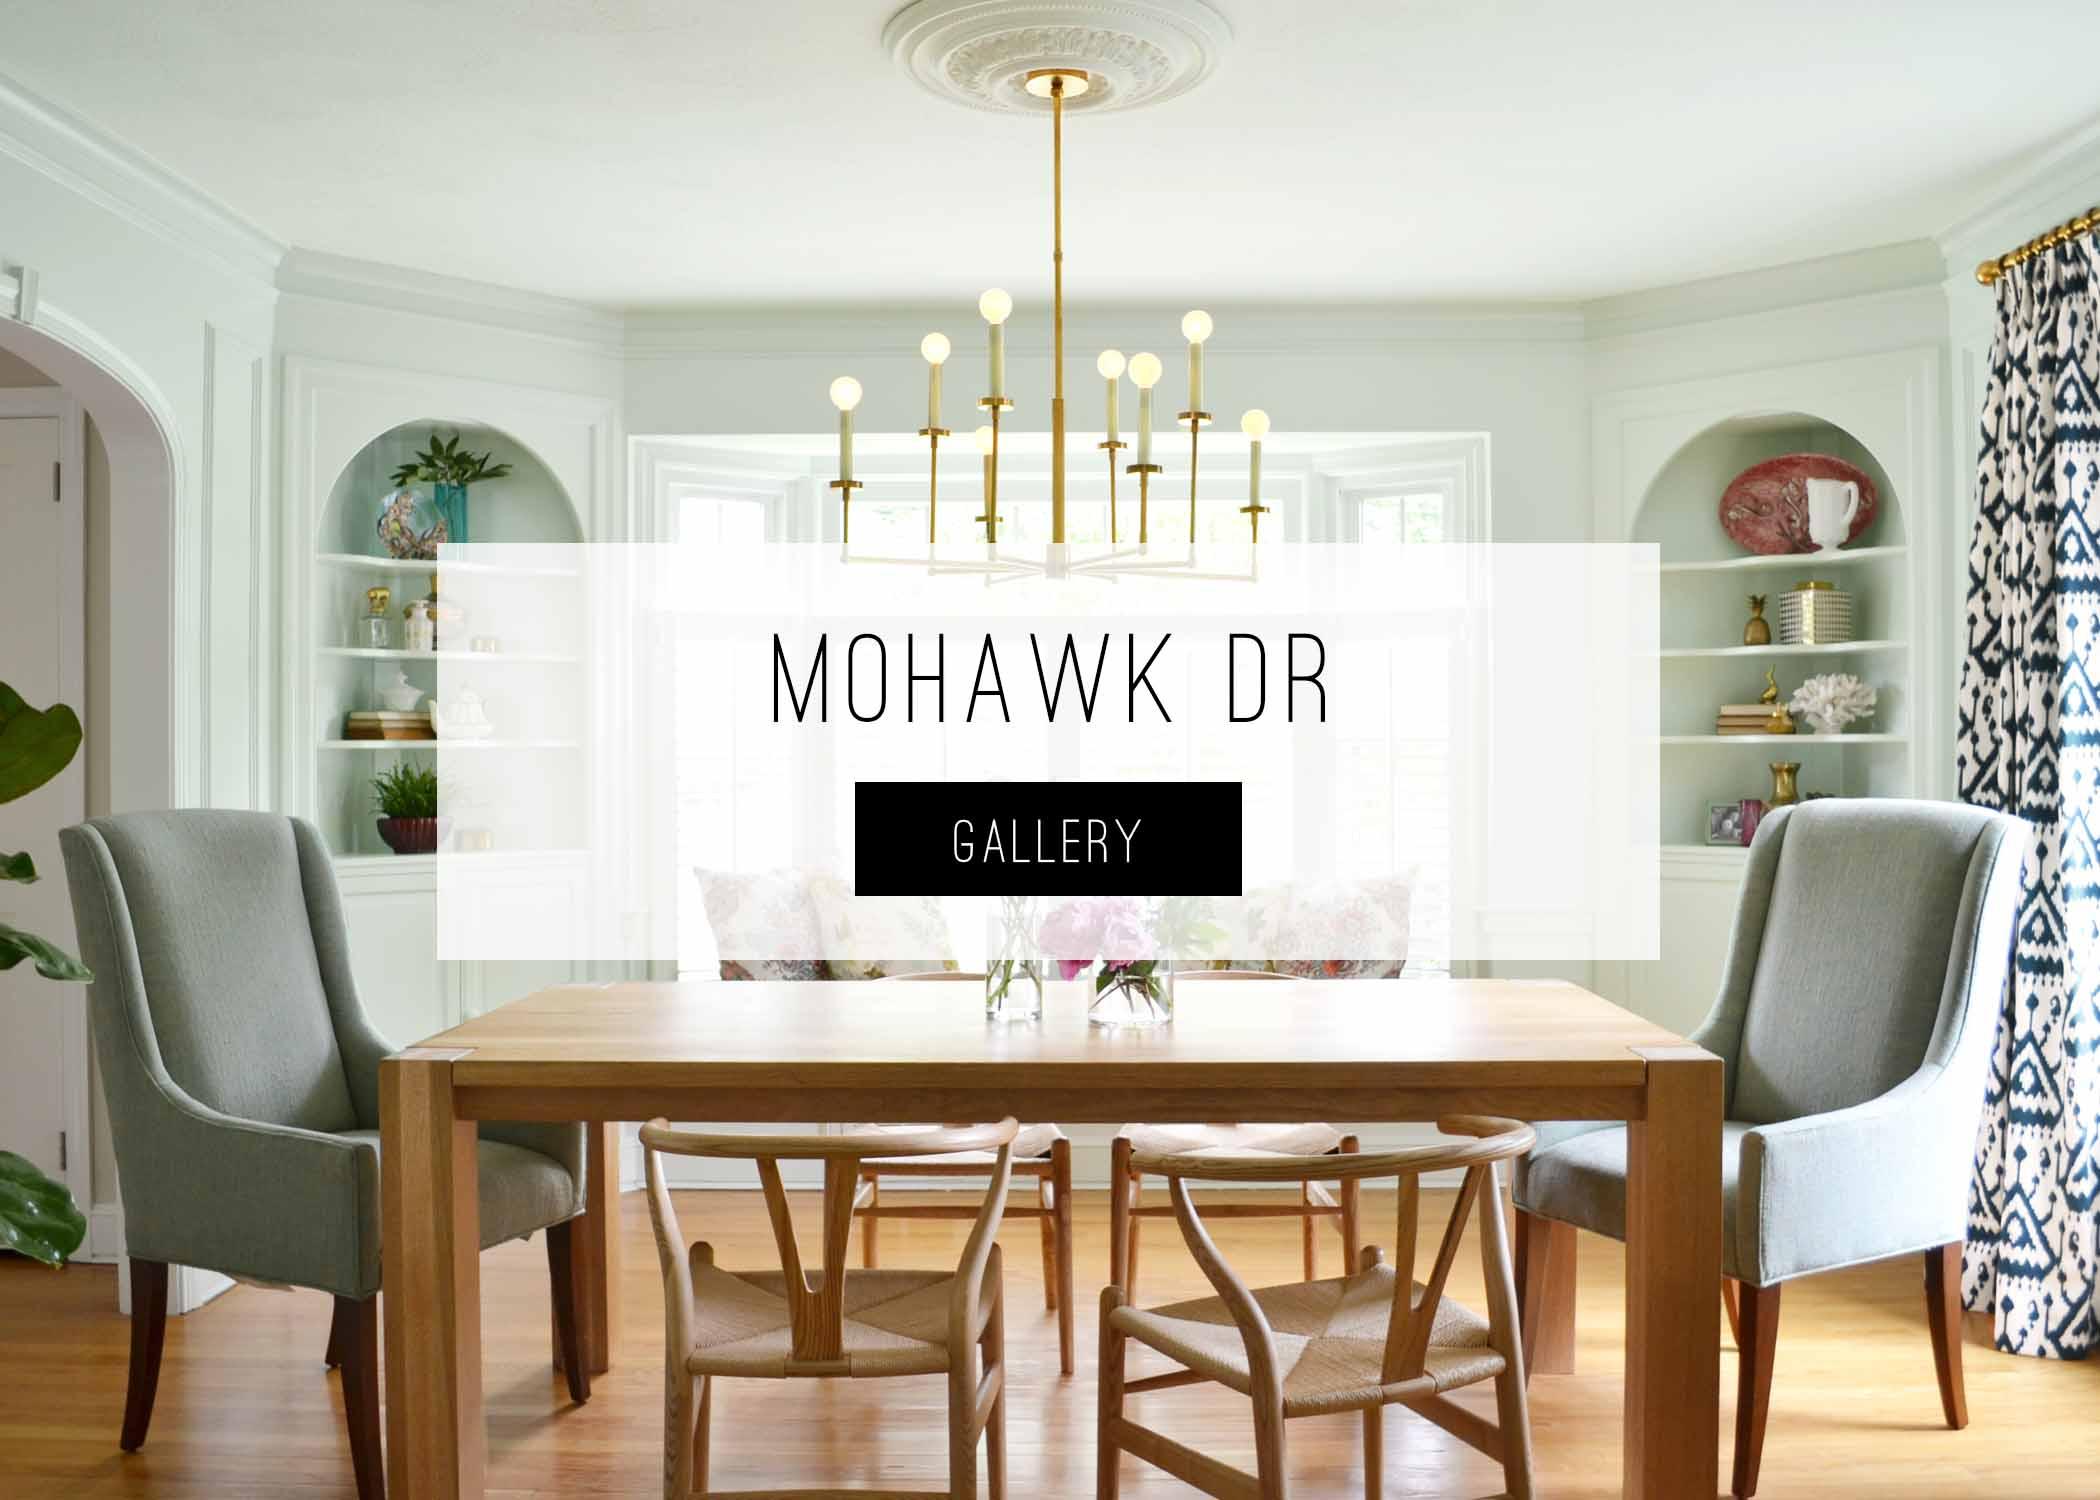 NEW-Mohawk.jpg